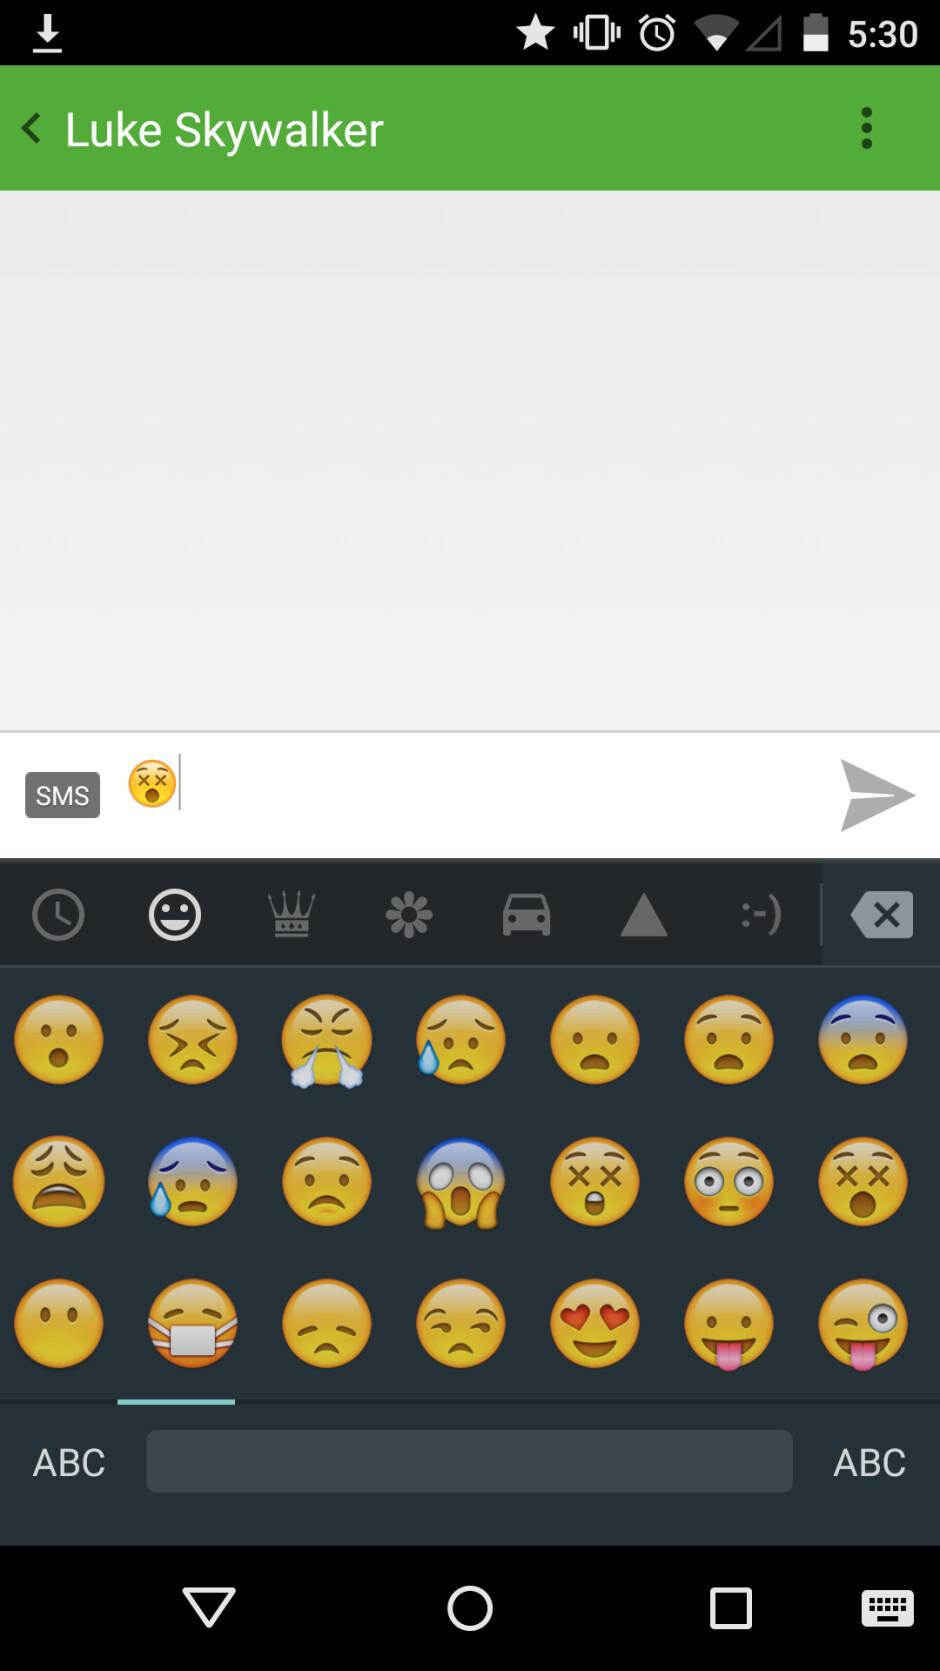 How to install the iOS emoji set on a Nexus 5